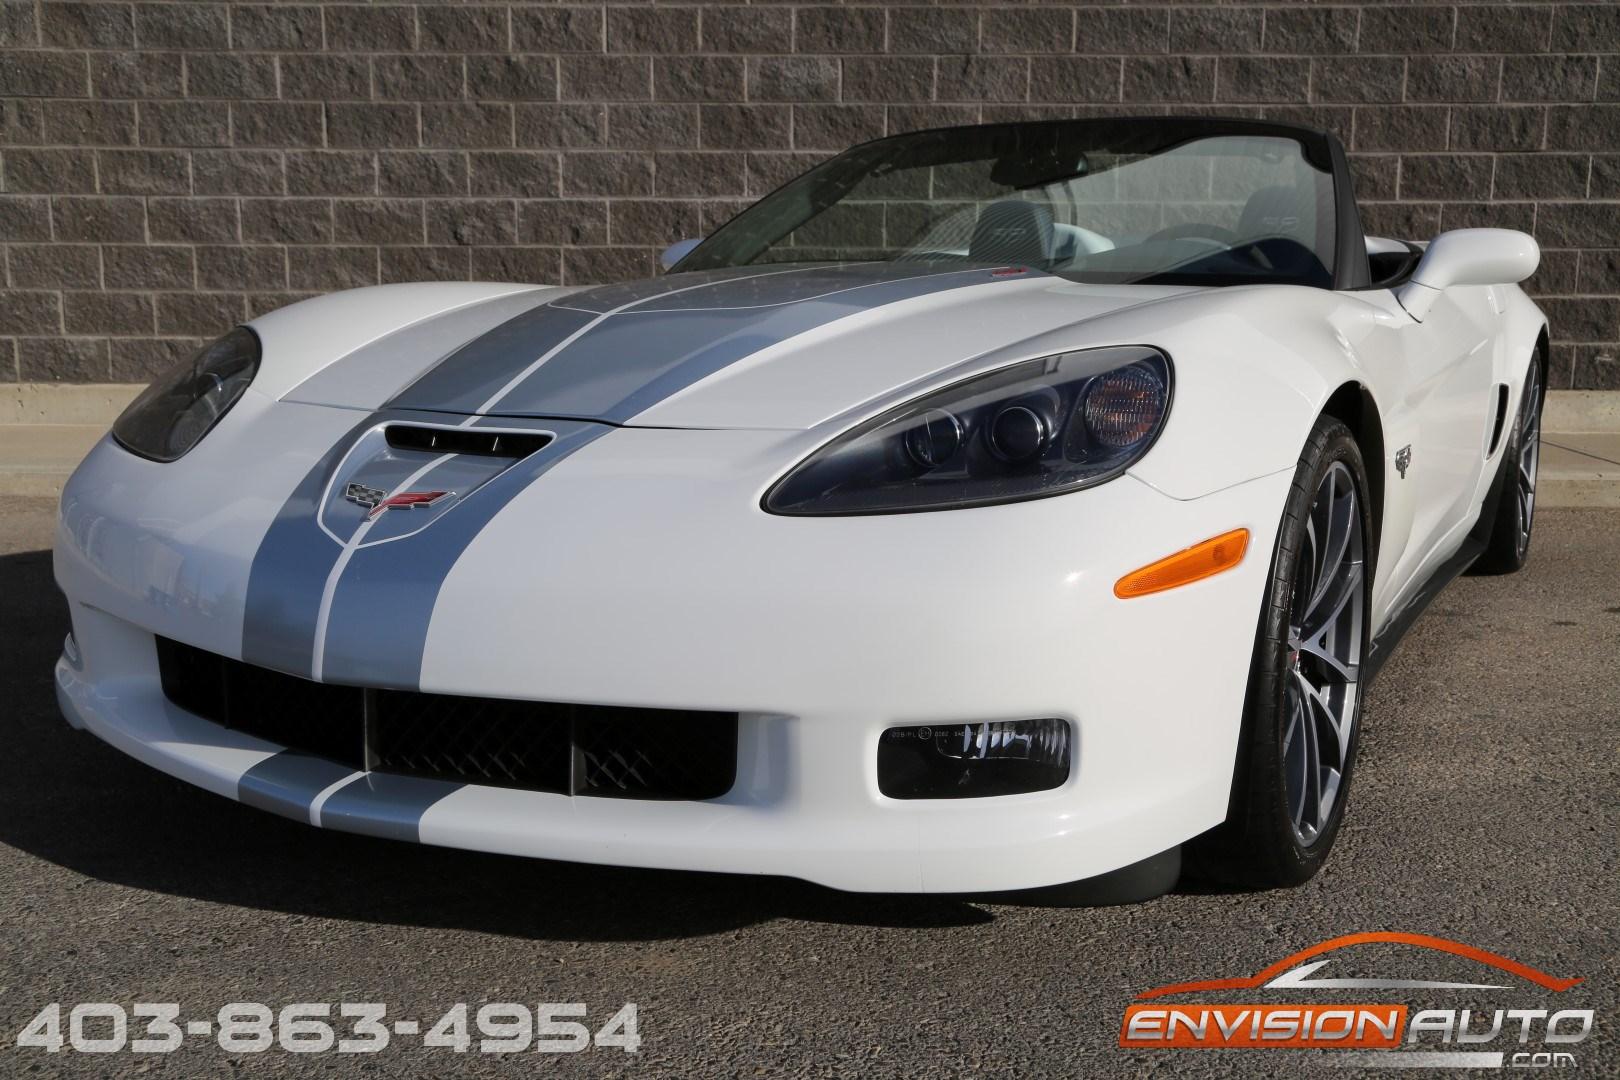 2013 chevrolet corvette 427 convertible 4lt collectors